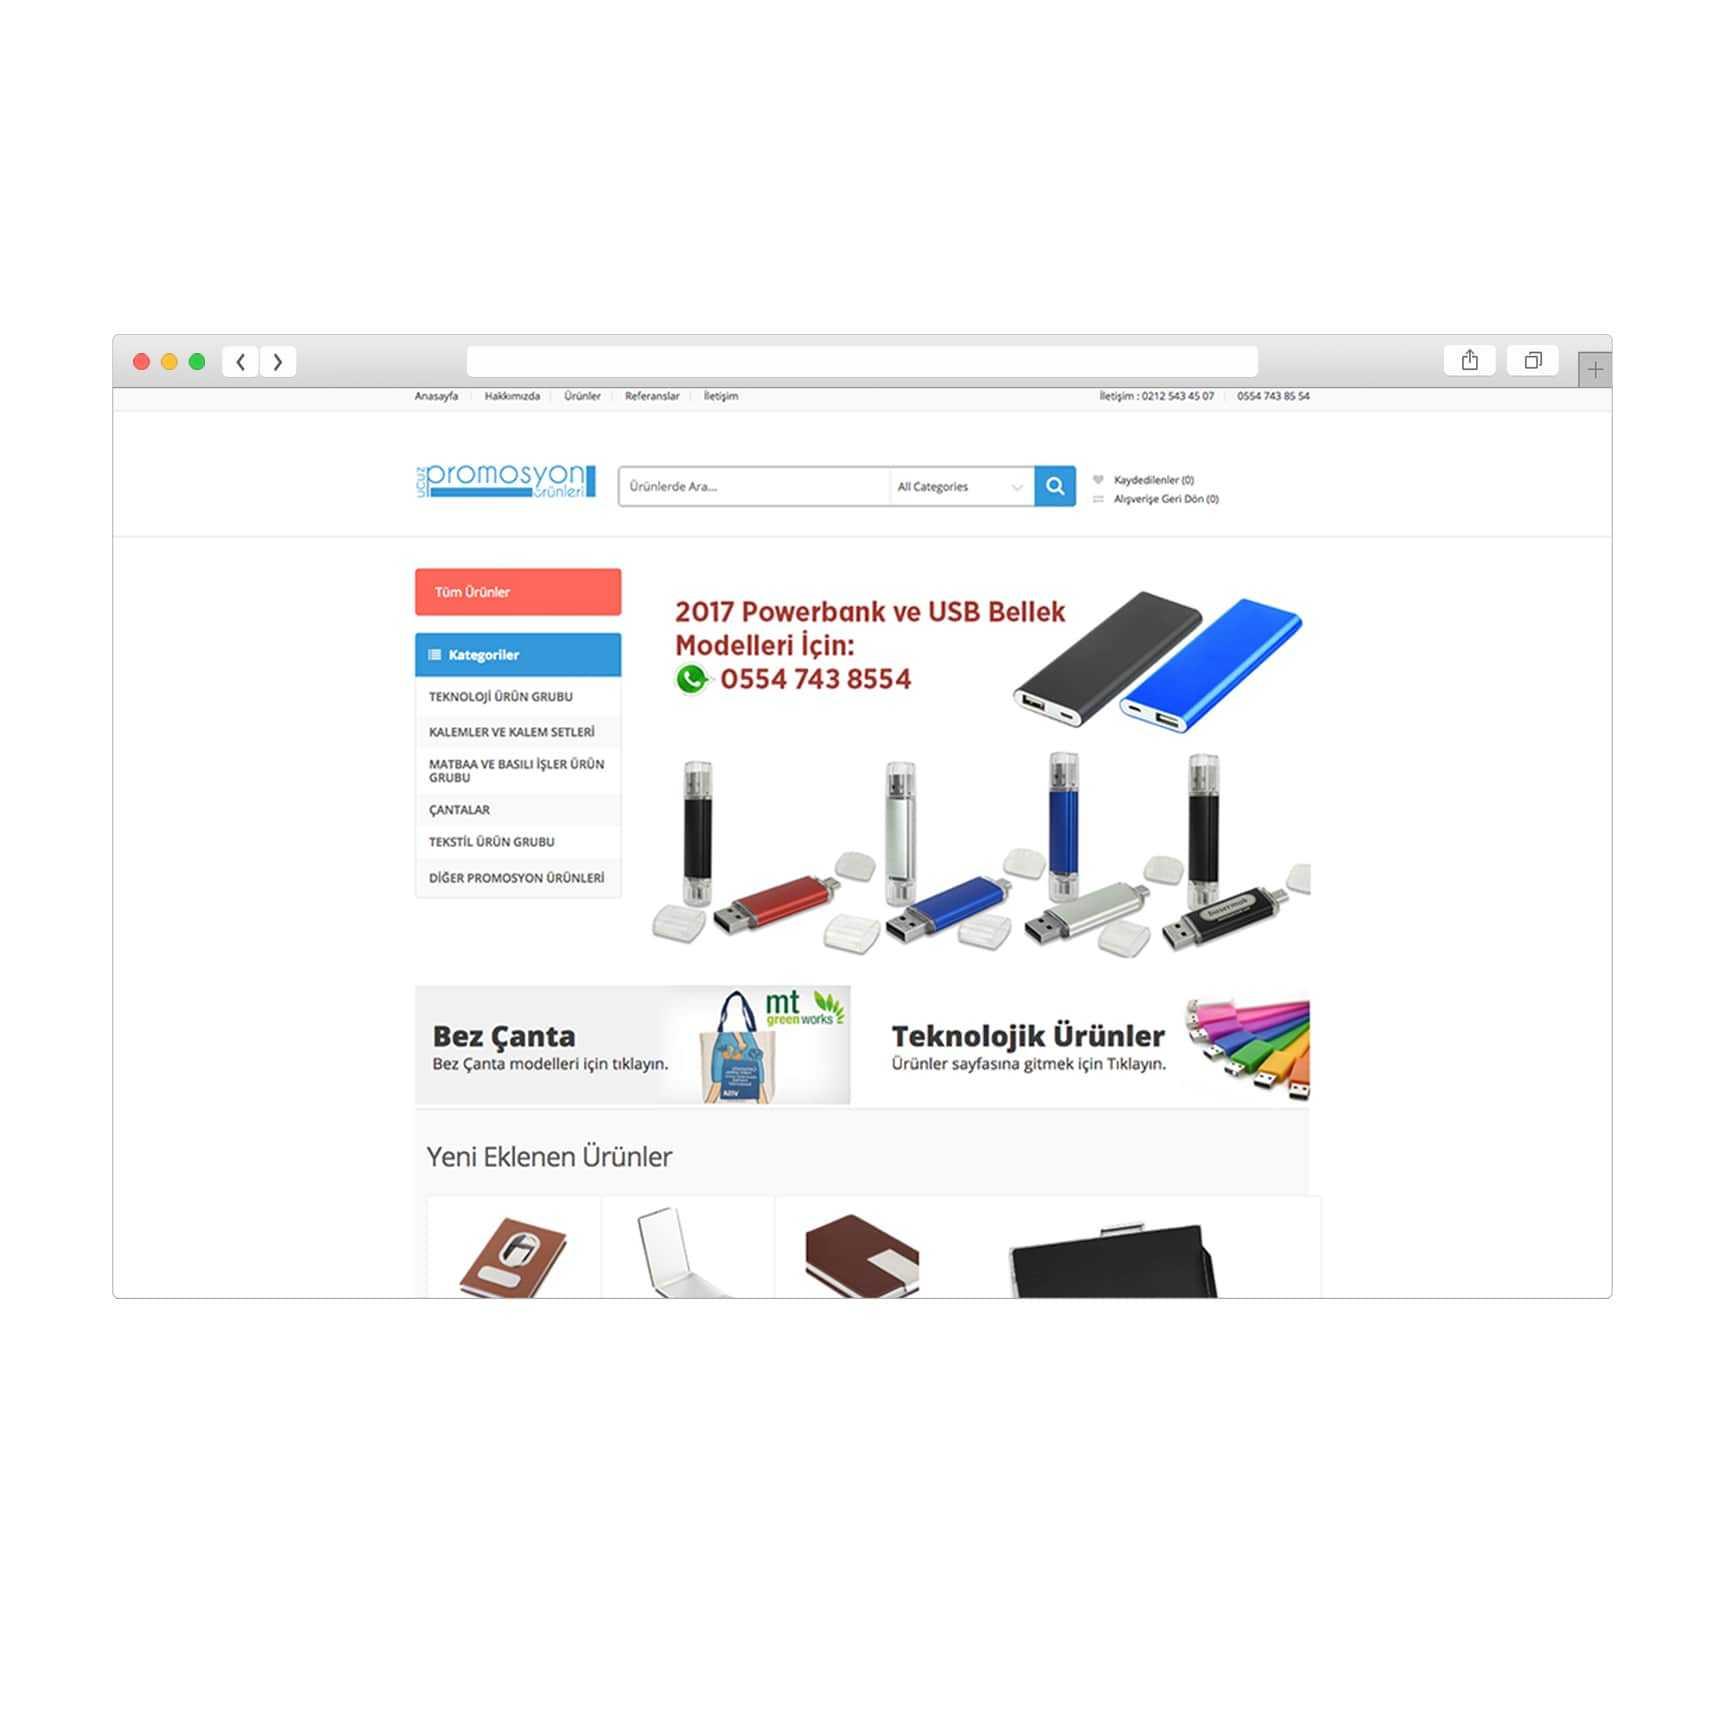 E-Ticaret Sitesi Ucuzpromosyonurunleri.net